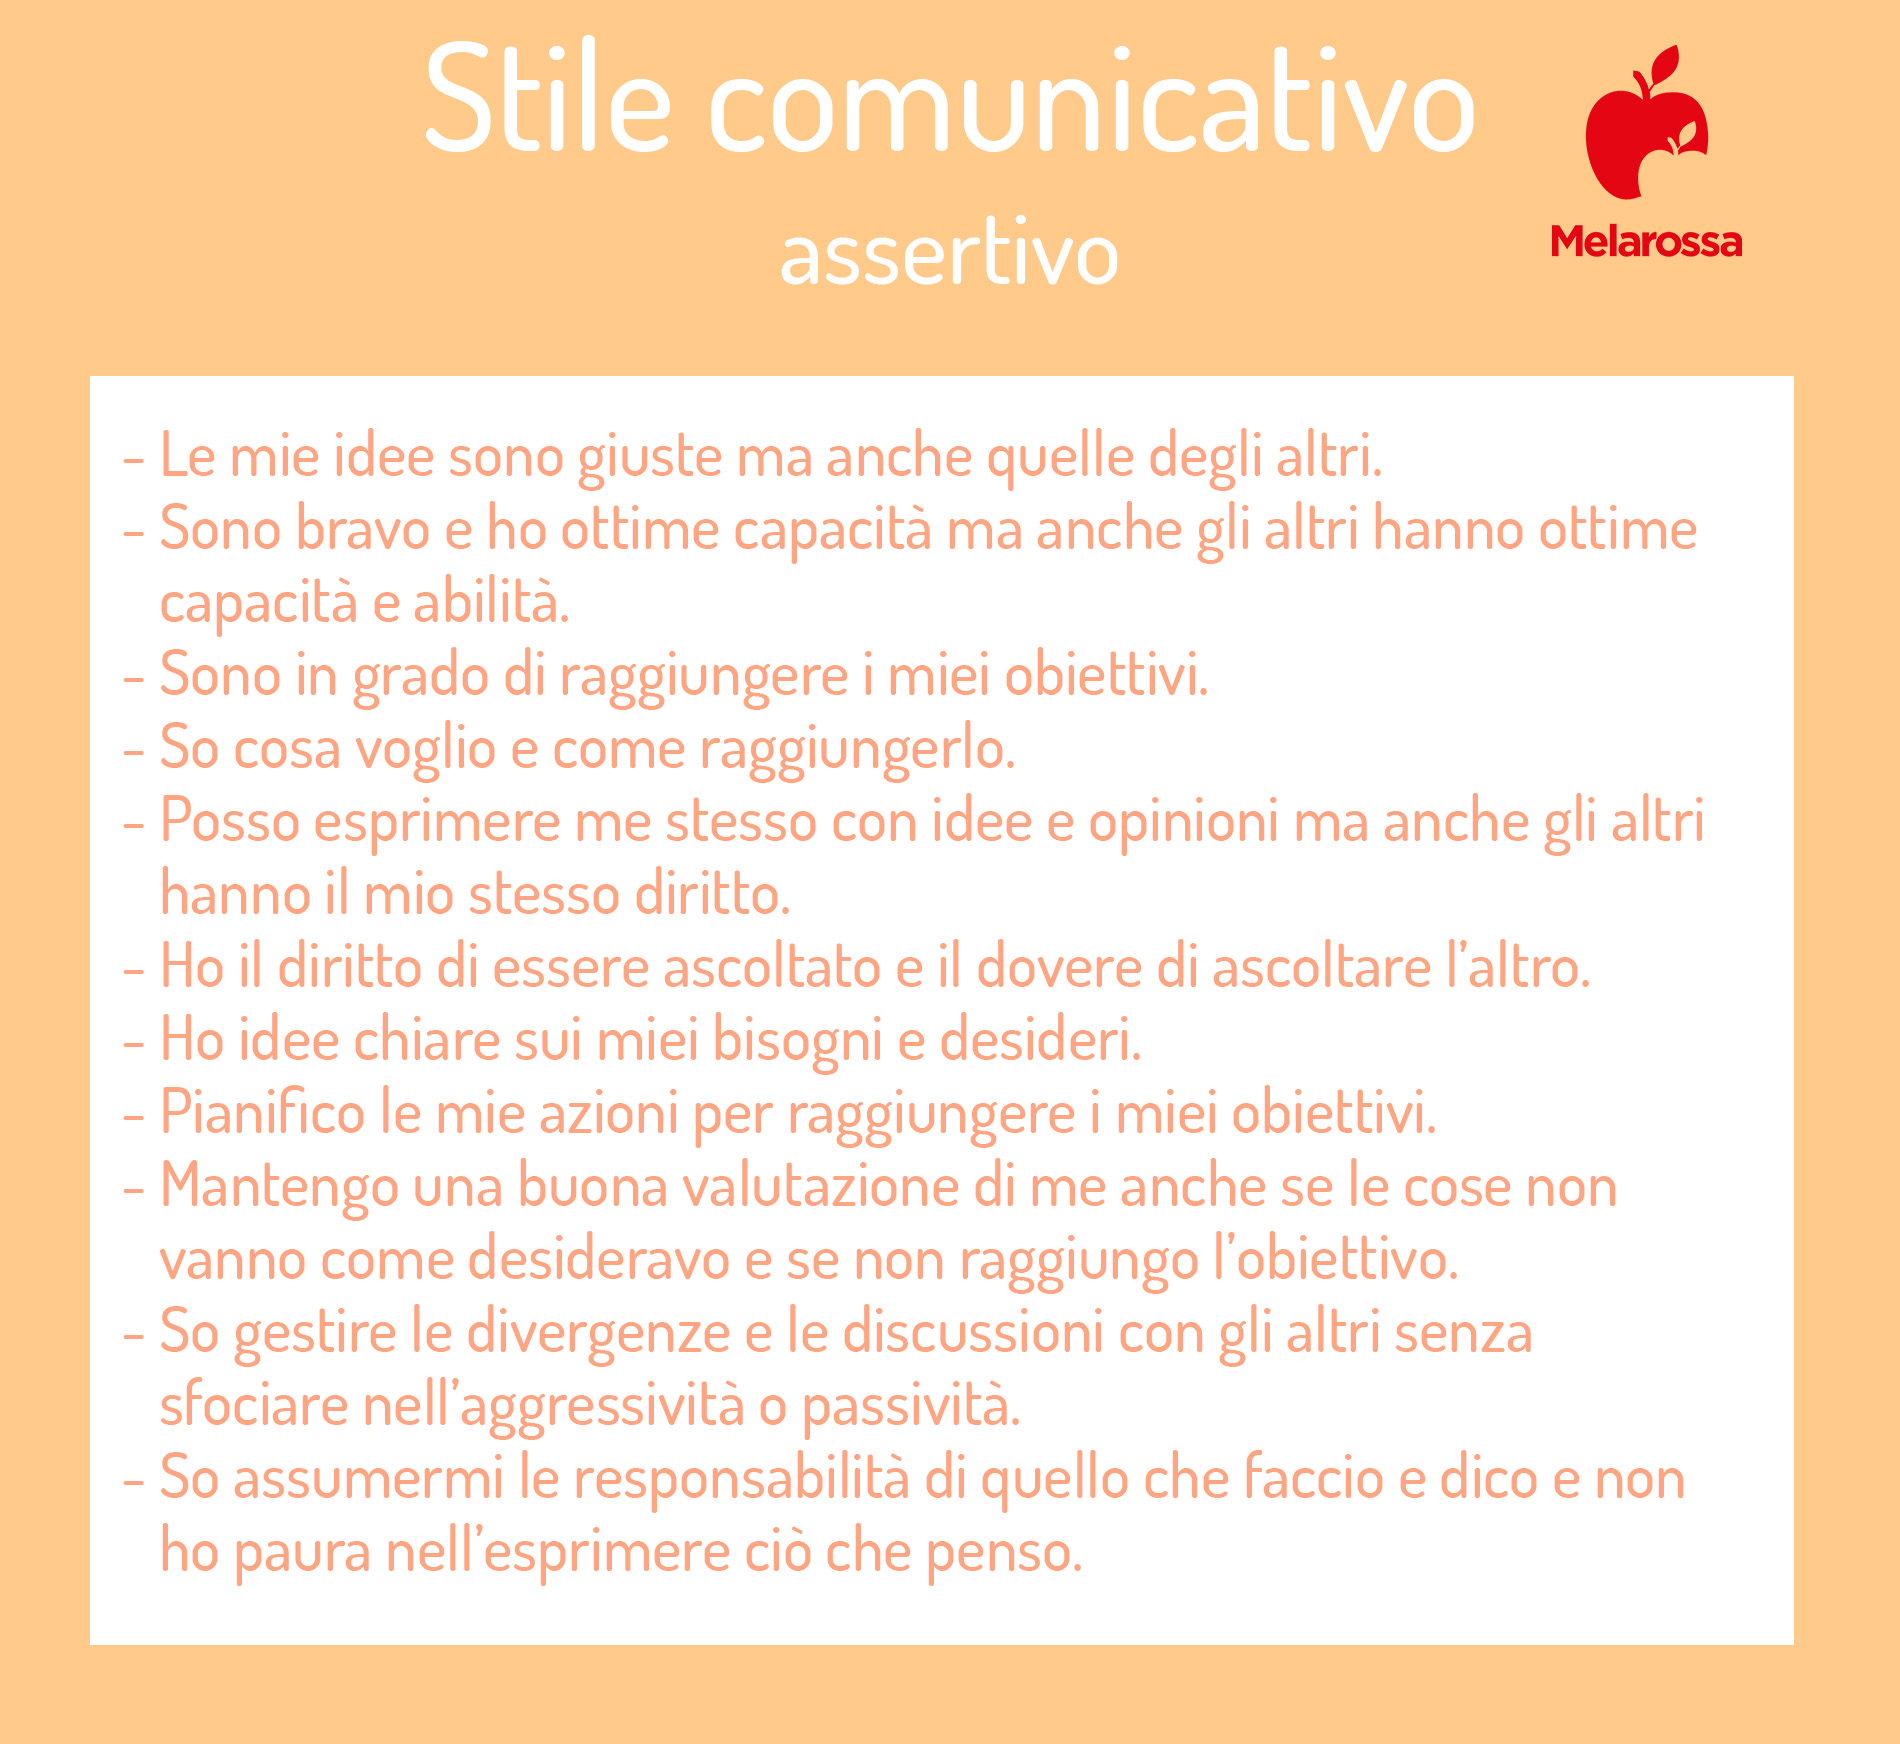 assertività: stile comunicativo